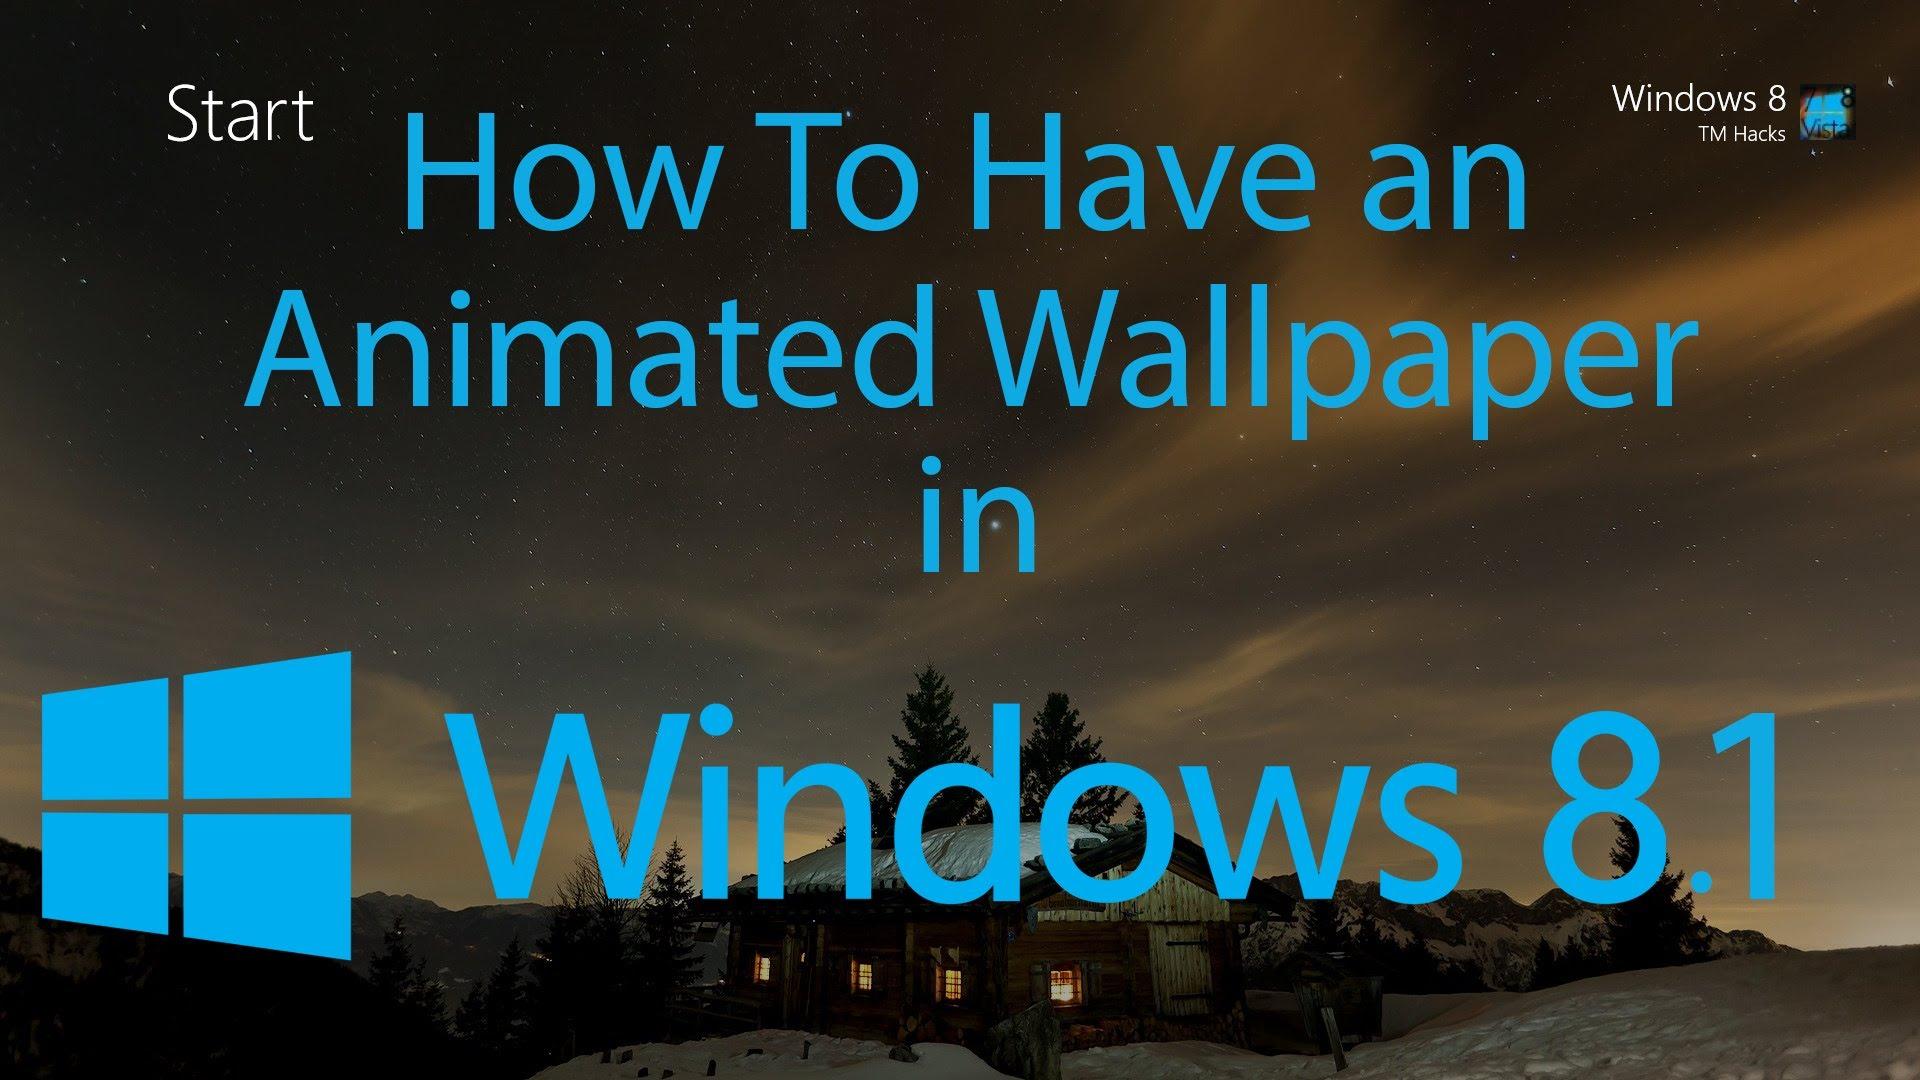 Live wallpaper for windows 8 1